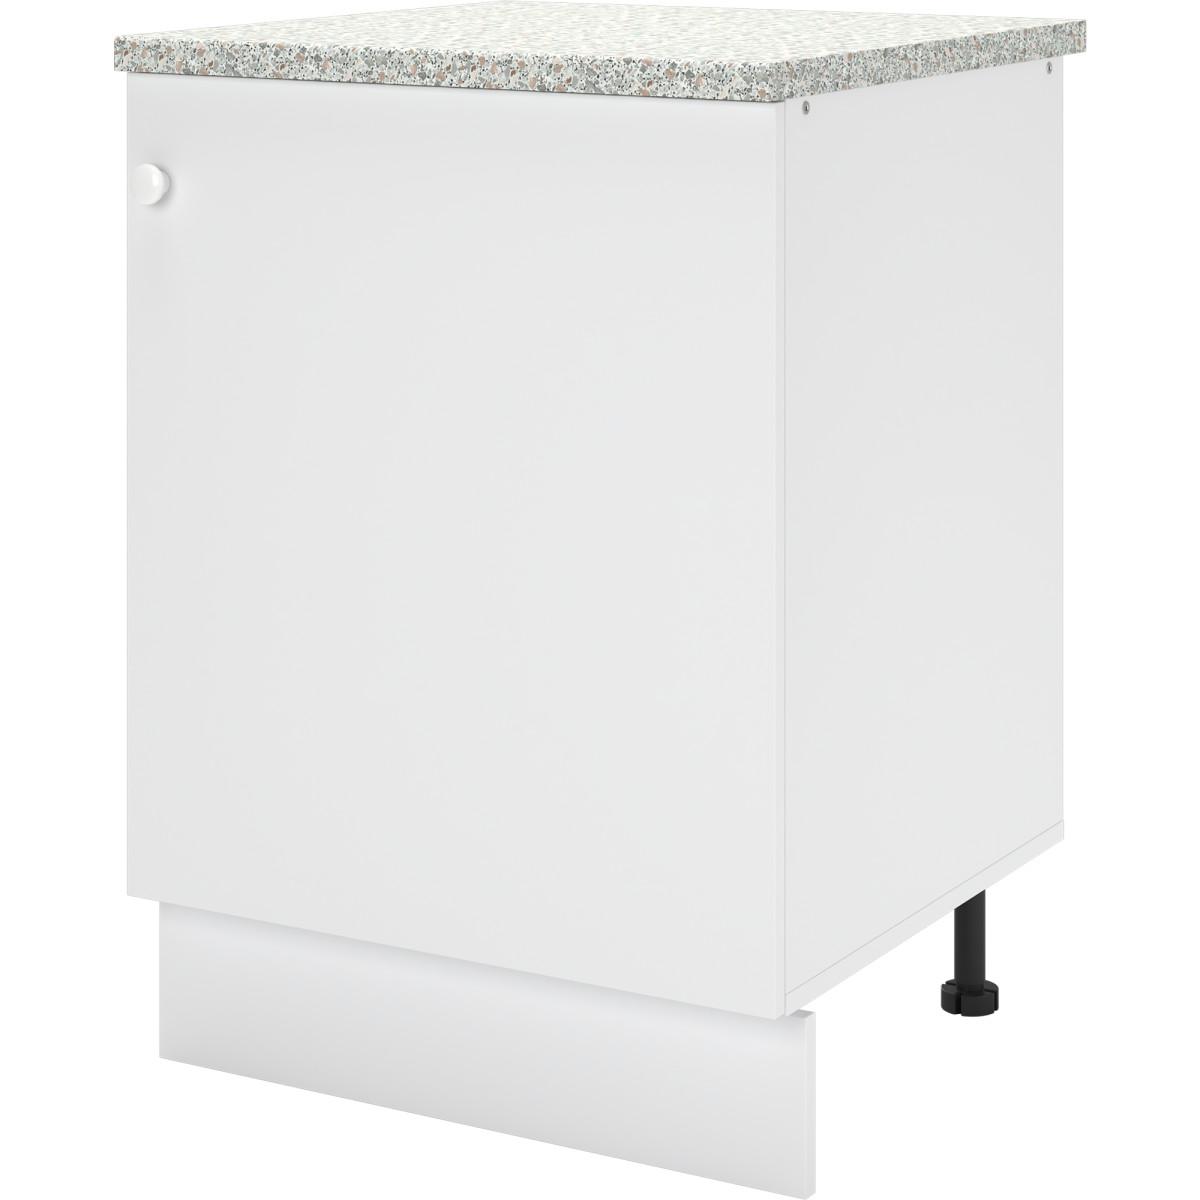 Шкаф напольный Бэлла 60x84x60 см ЛДСП цвет белый